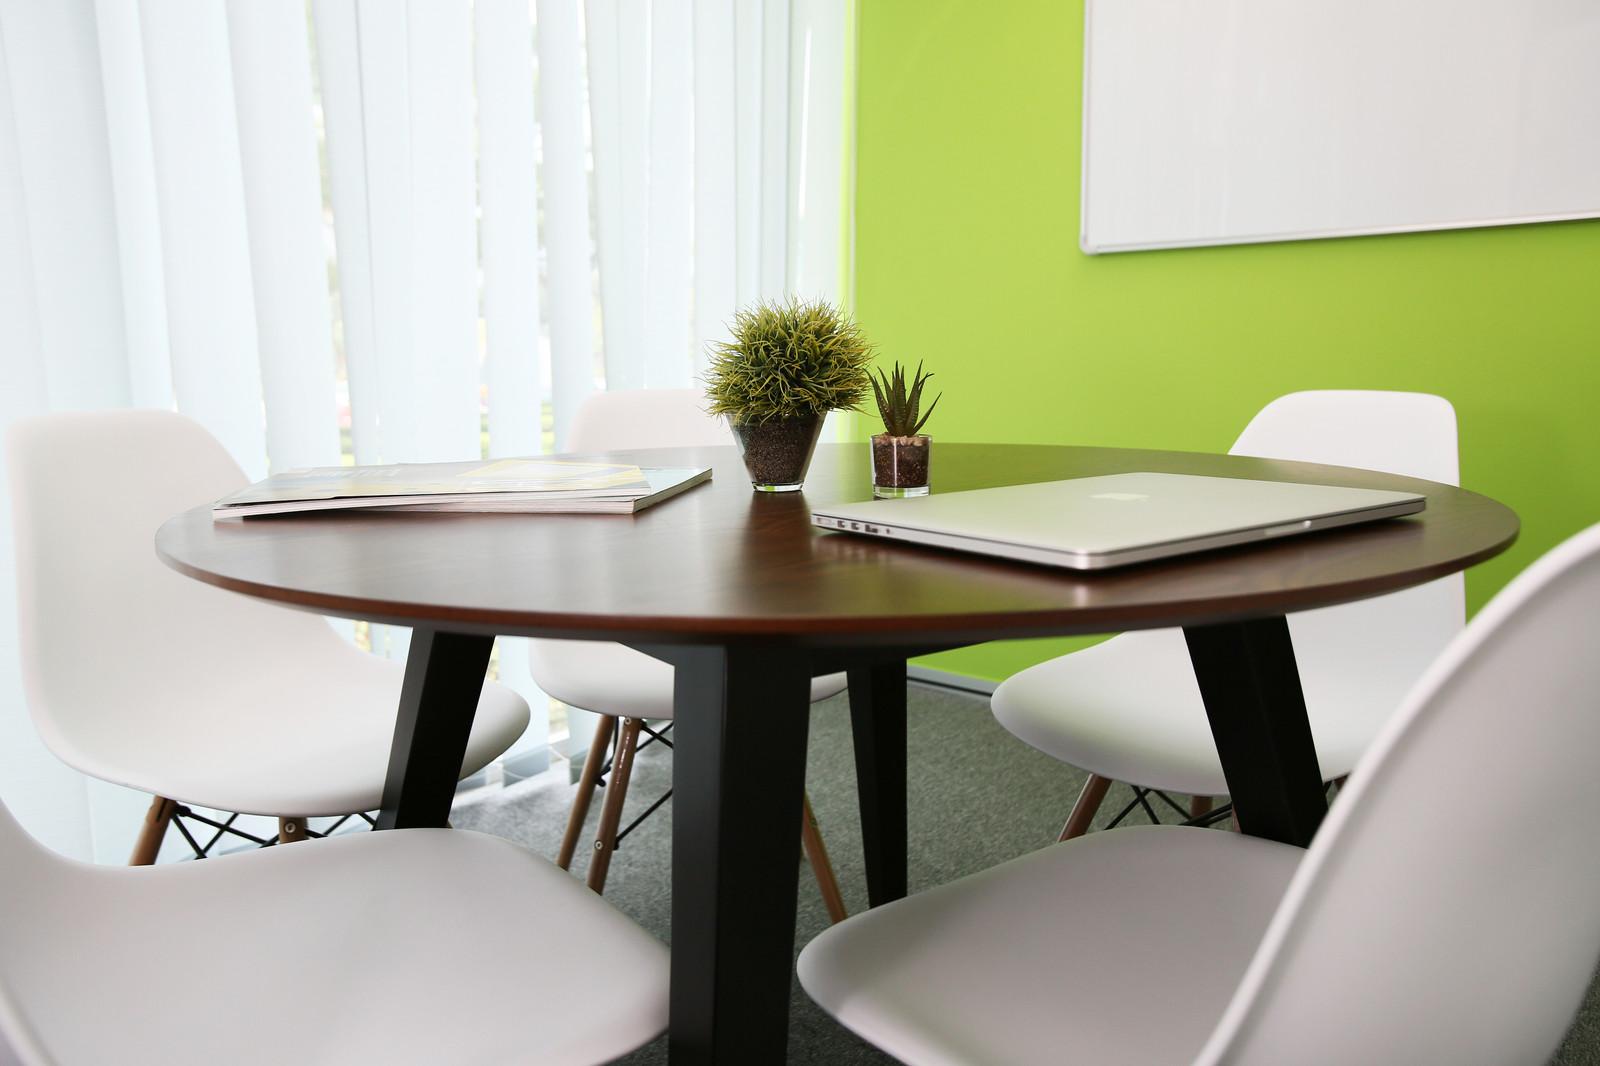 office chair penang organizer pockets ethixbase 360 interior design grov